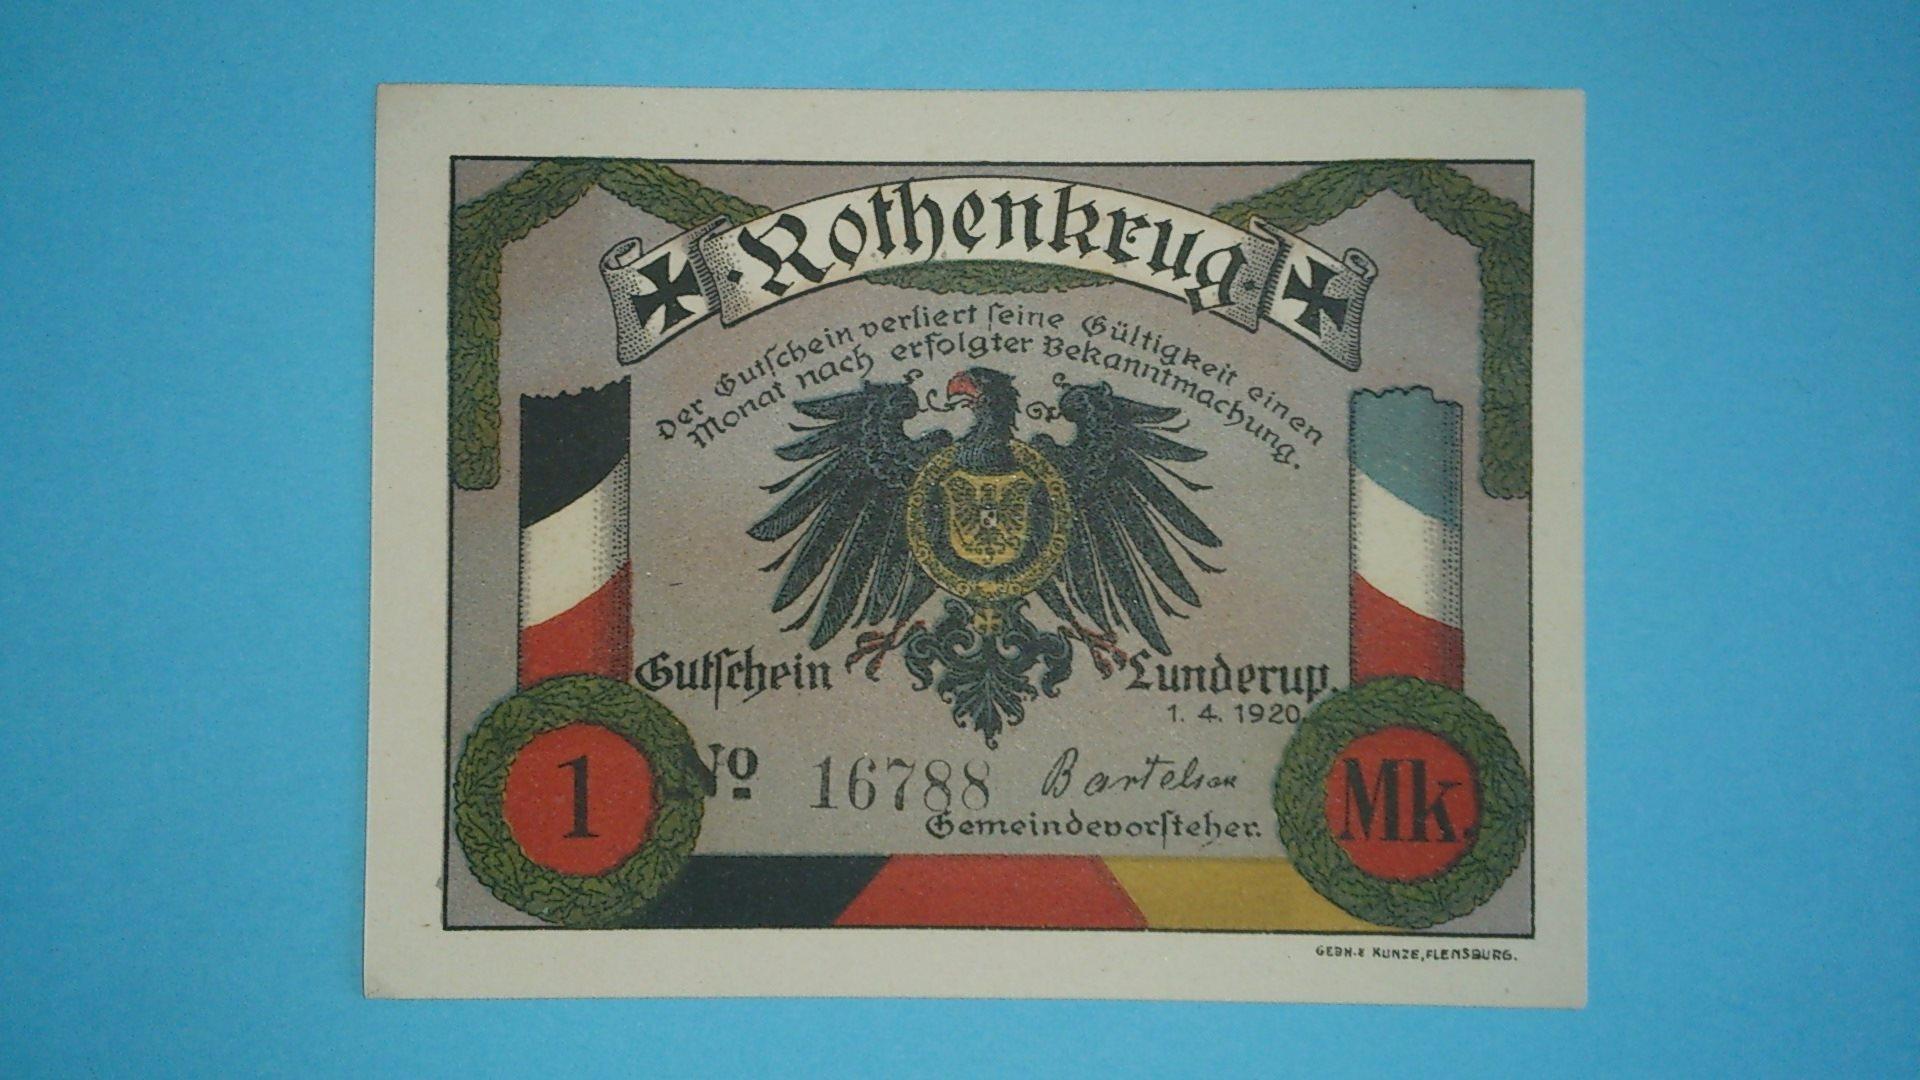 kro tyskland